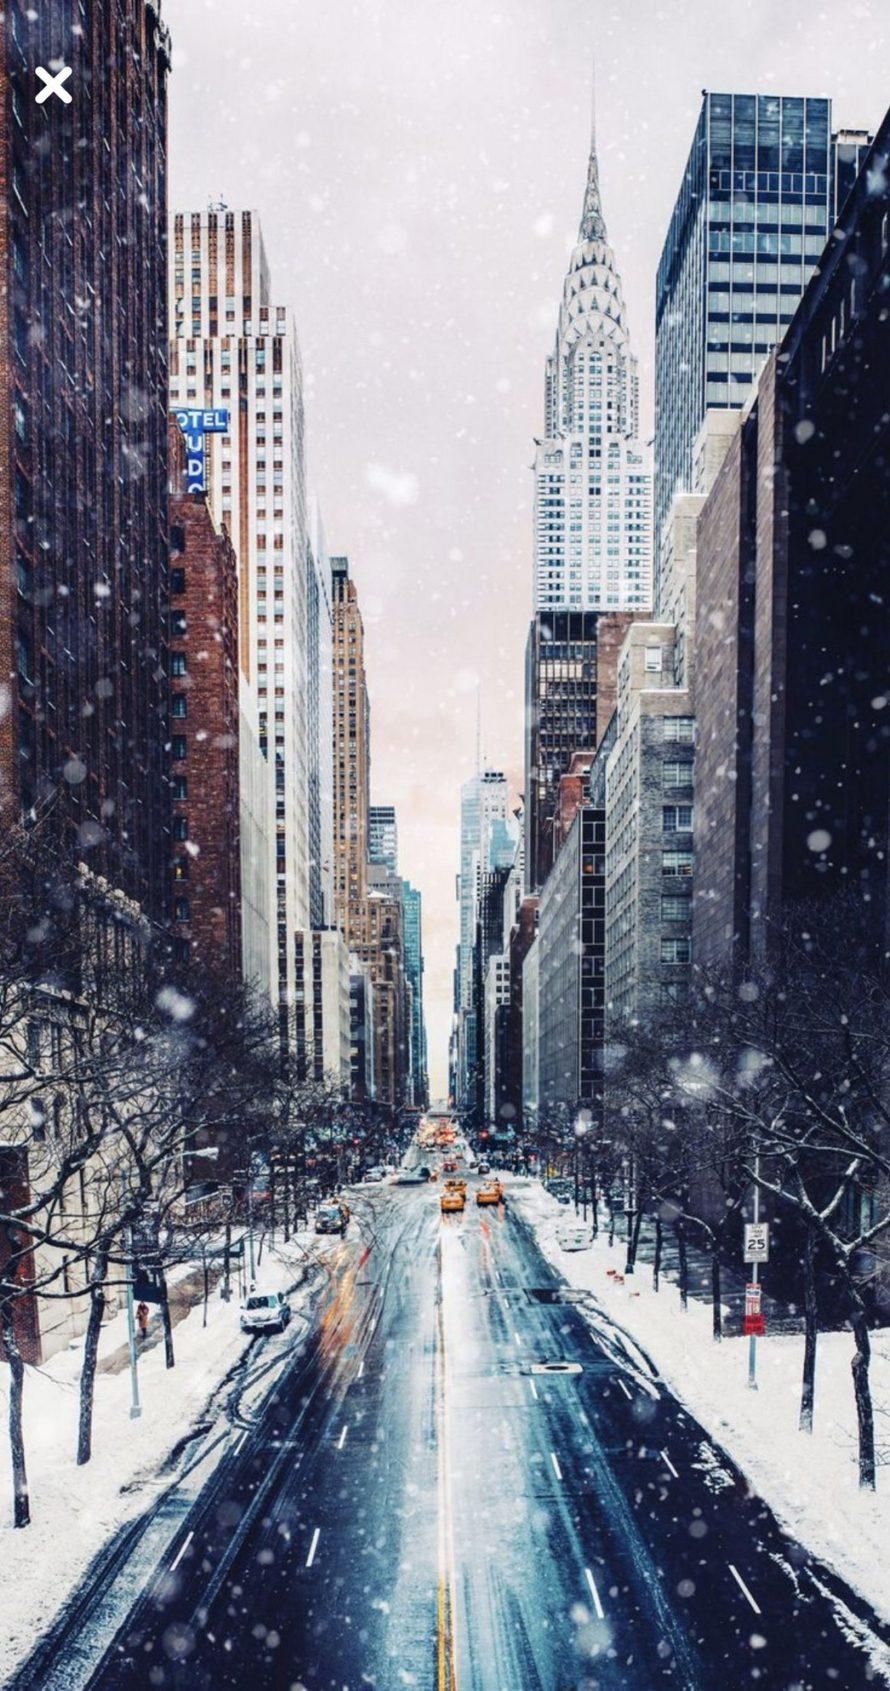 Nyc Winter Iphone Wallpaper Iphone Winter Wallpaper 4k 890x1691 Download Hd Wallpaper Wallpapertip